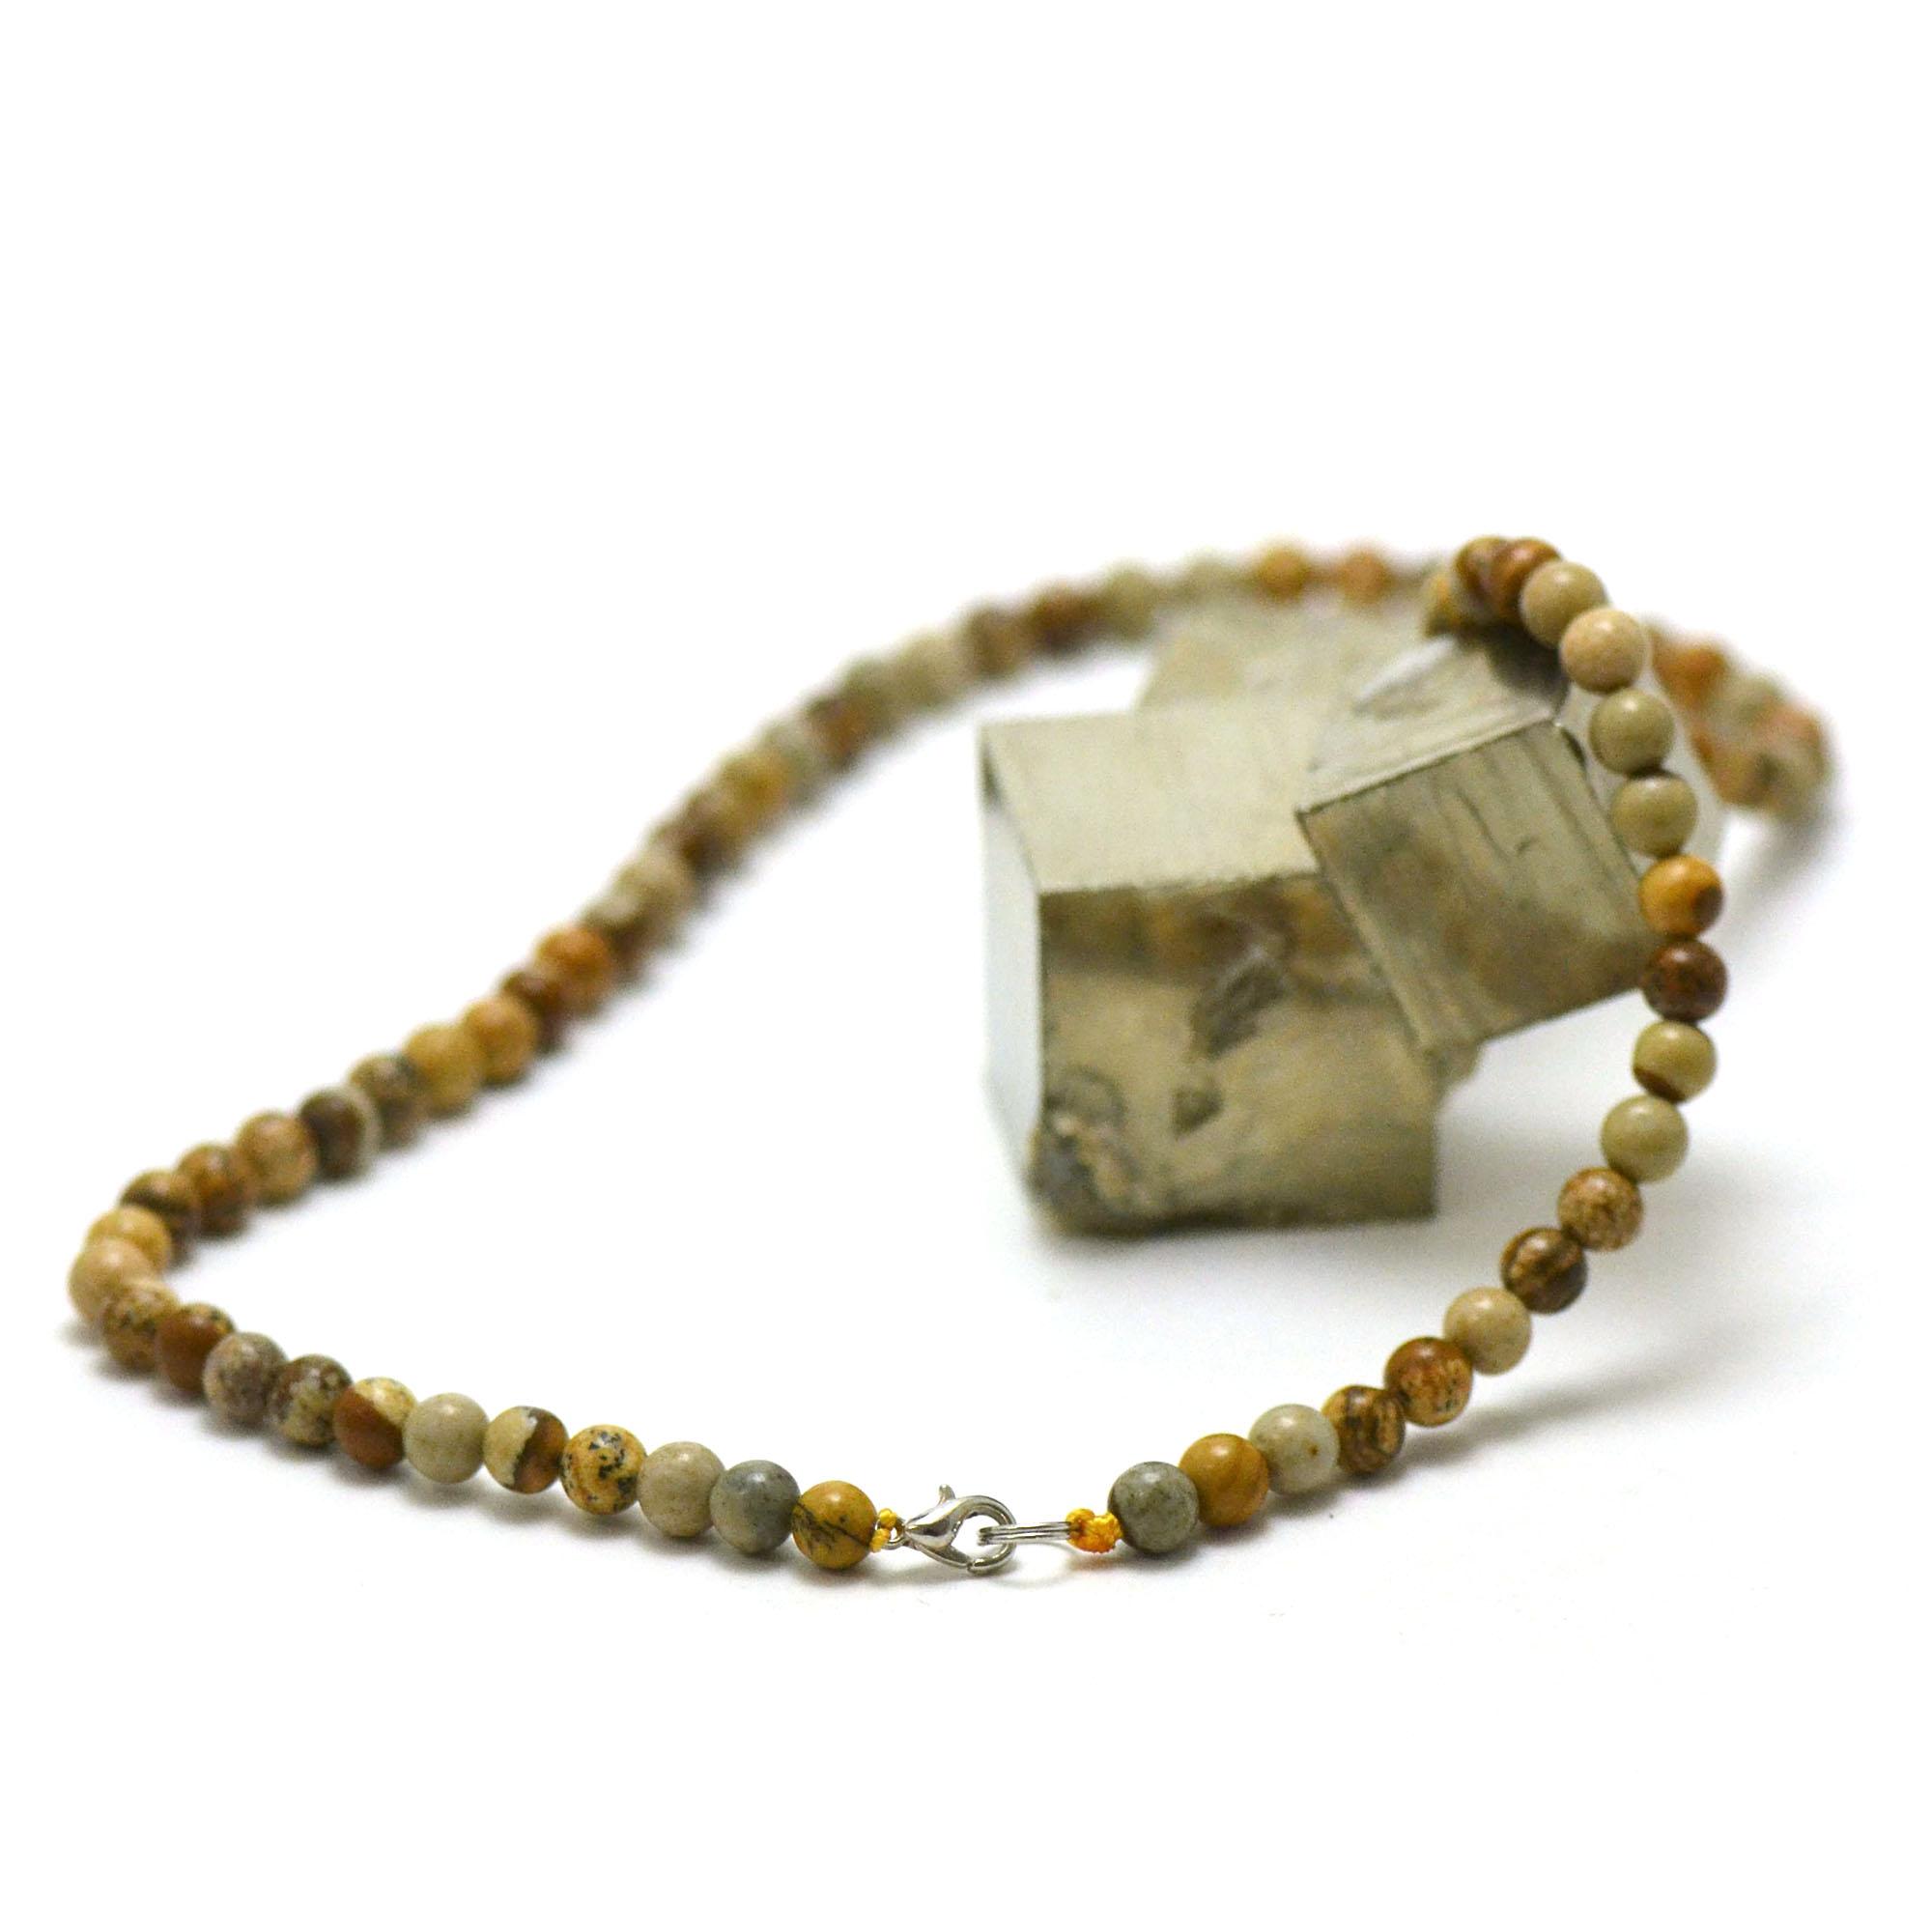 collier en jaspe paysage, perle ronde 6 mm